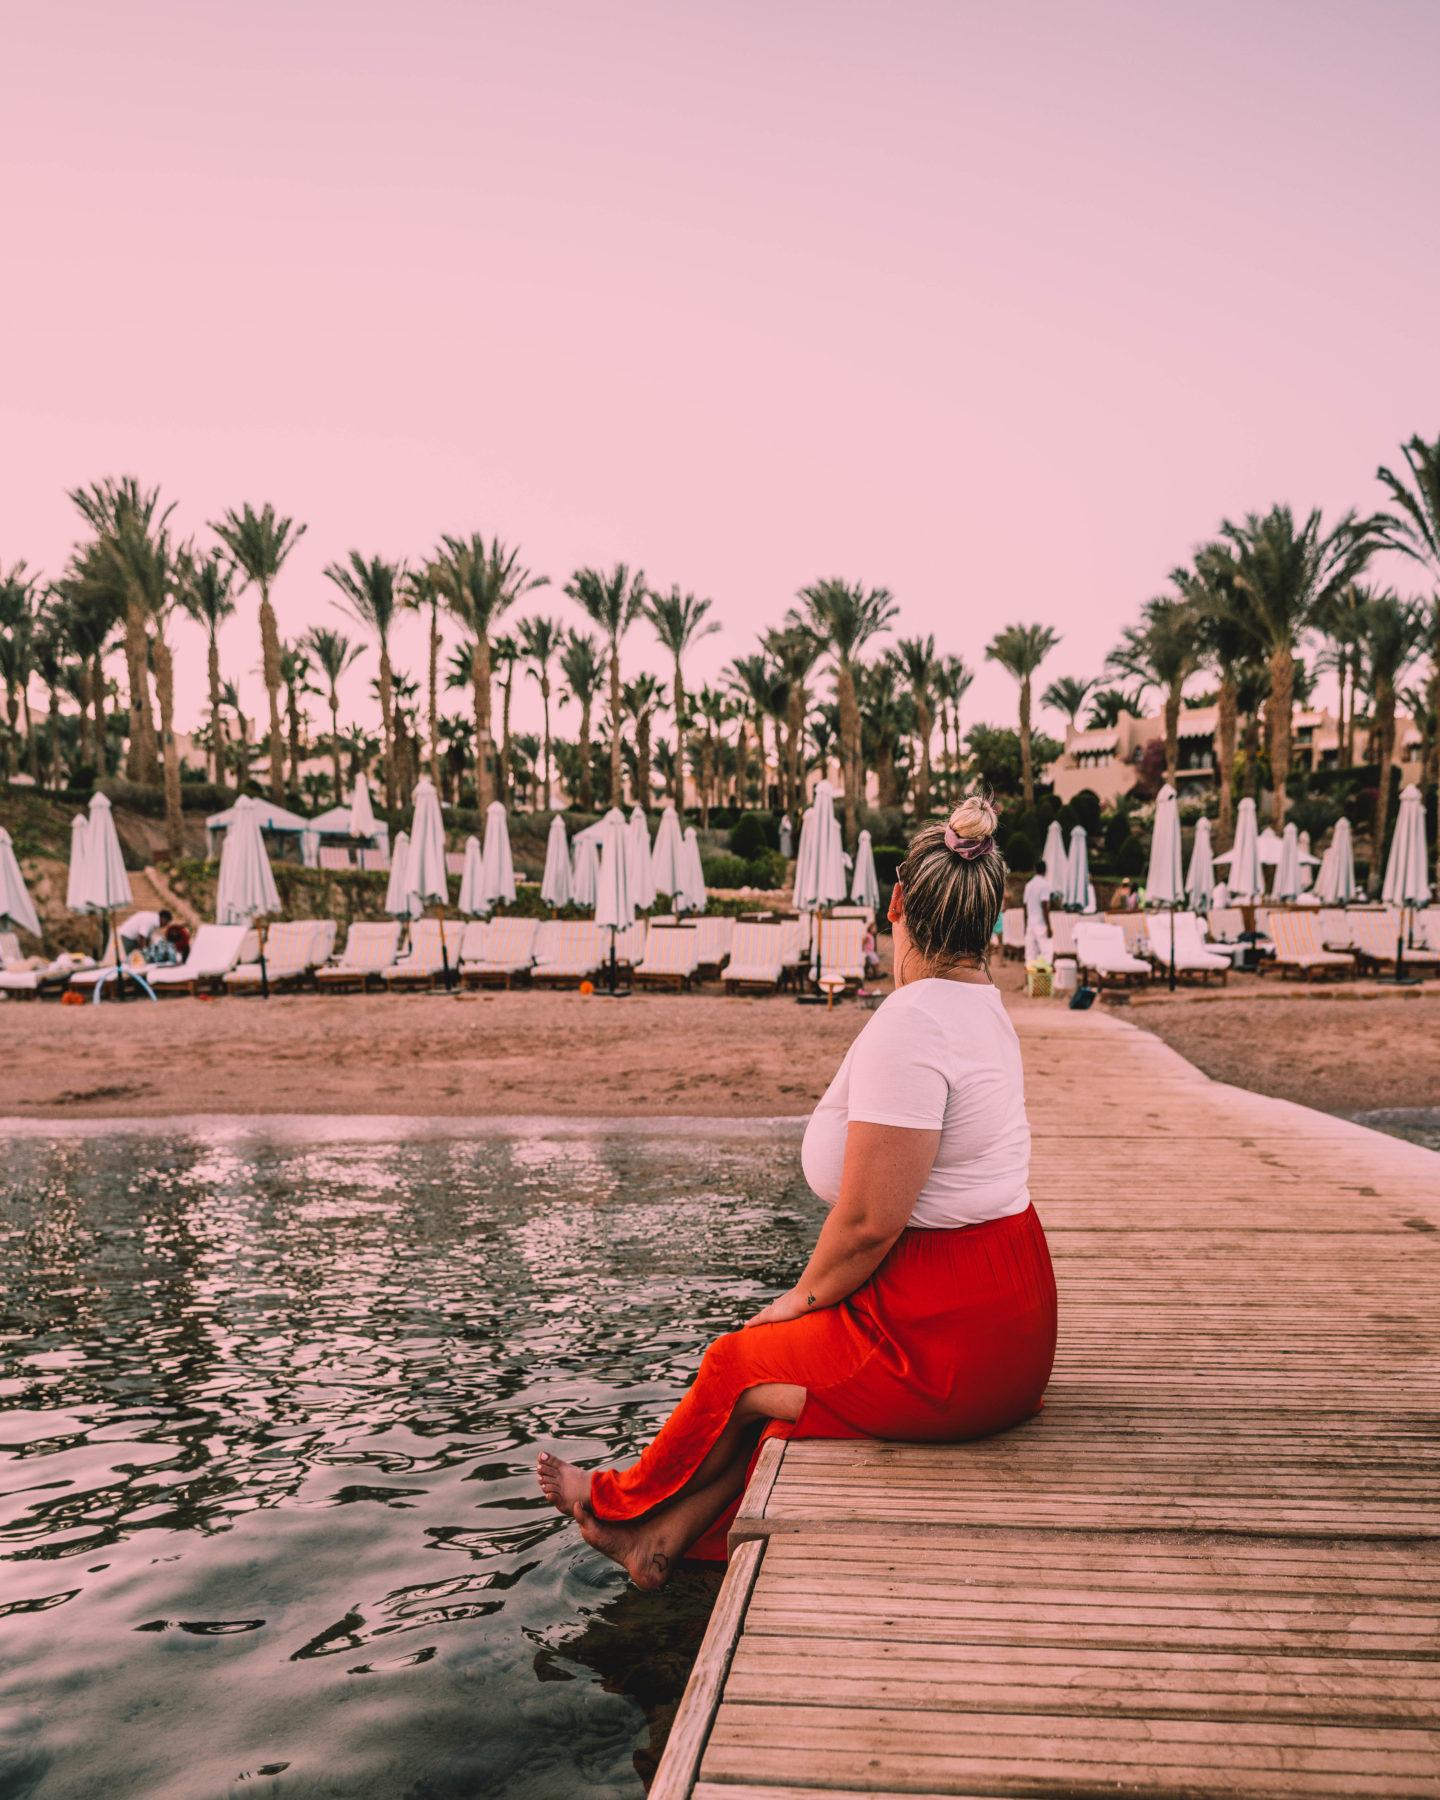 sunset at the pier at Four Seasons Sharm El Sheikh